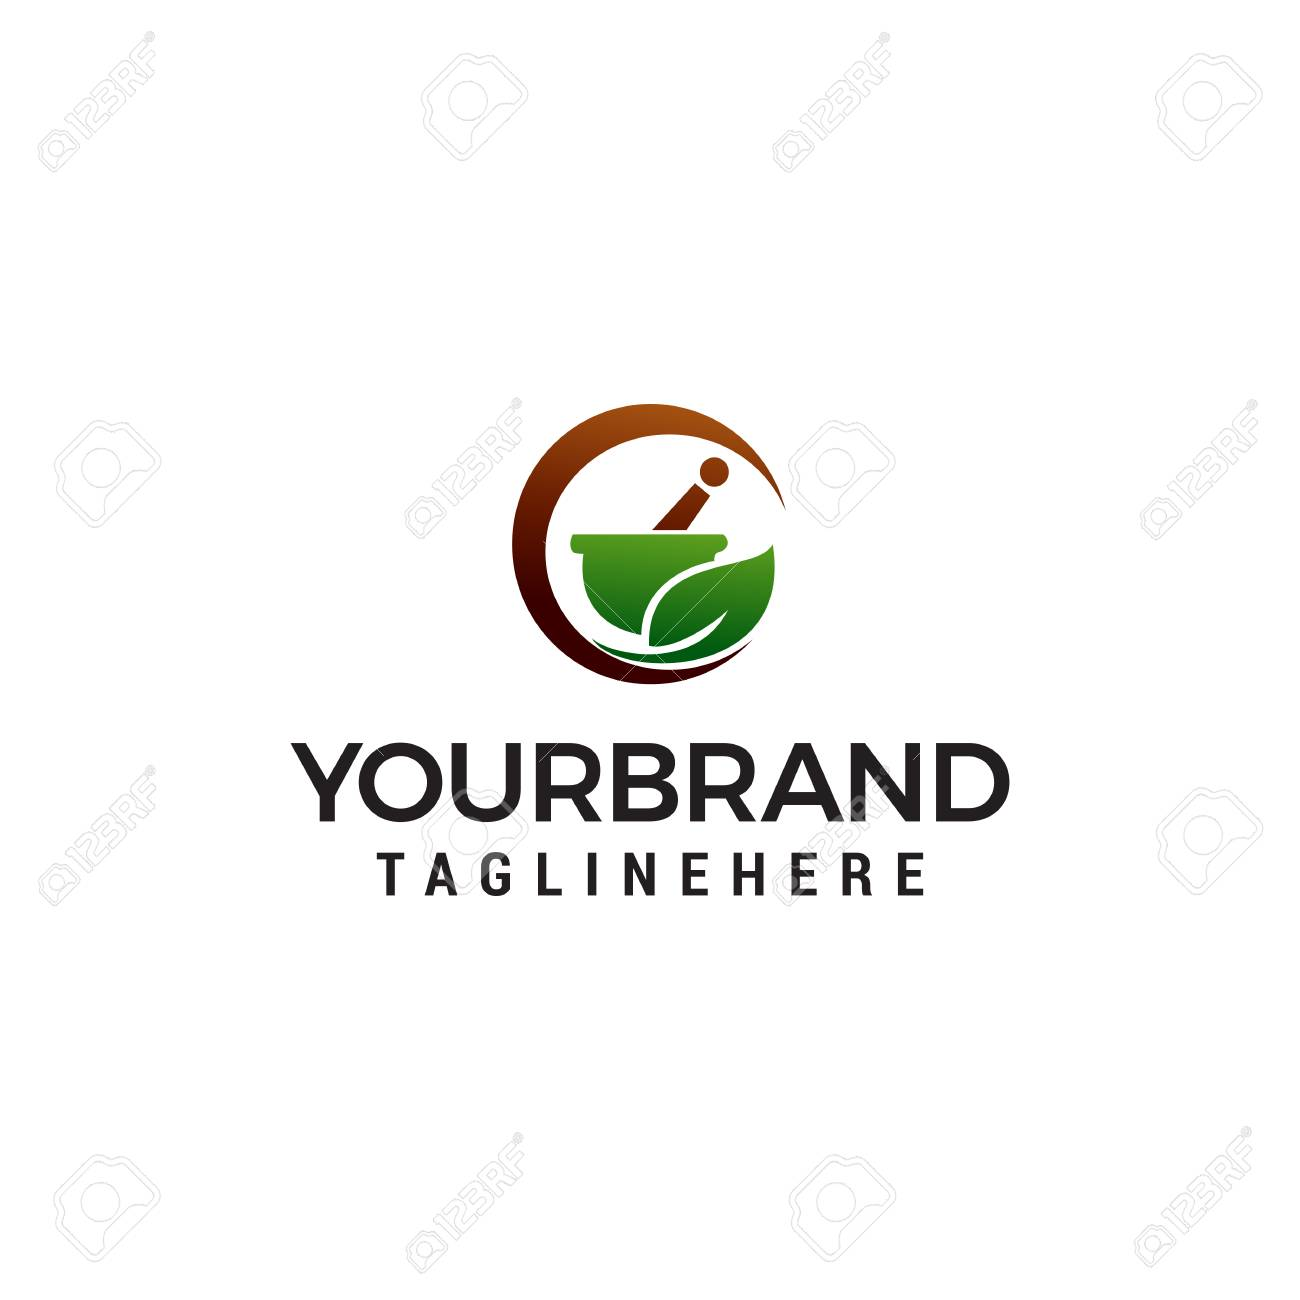 pharmacy herbal logo design concept template vector - 122373381